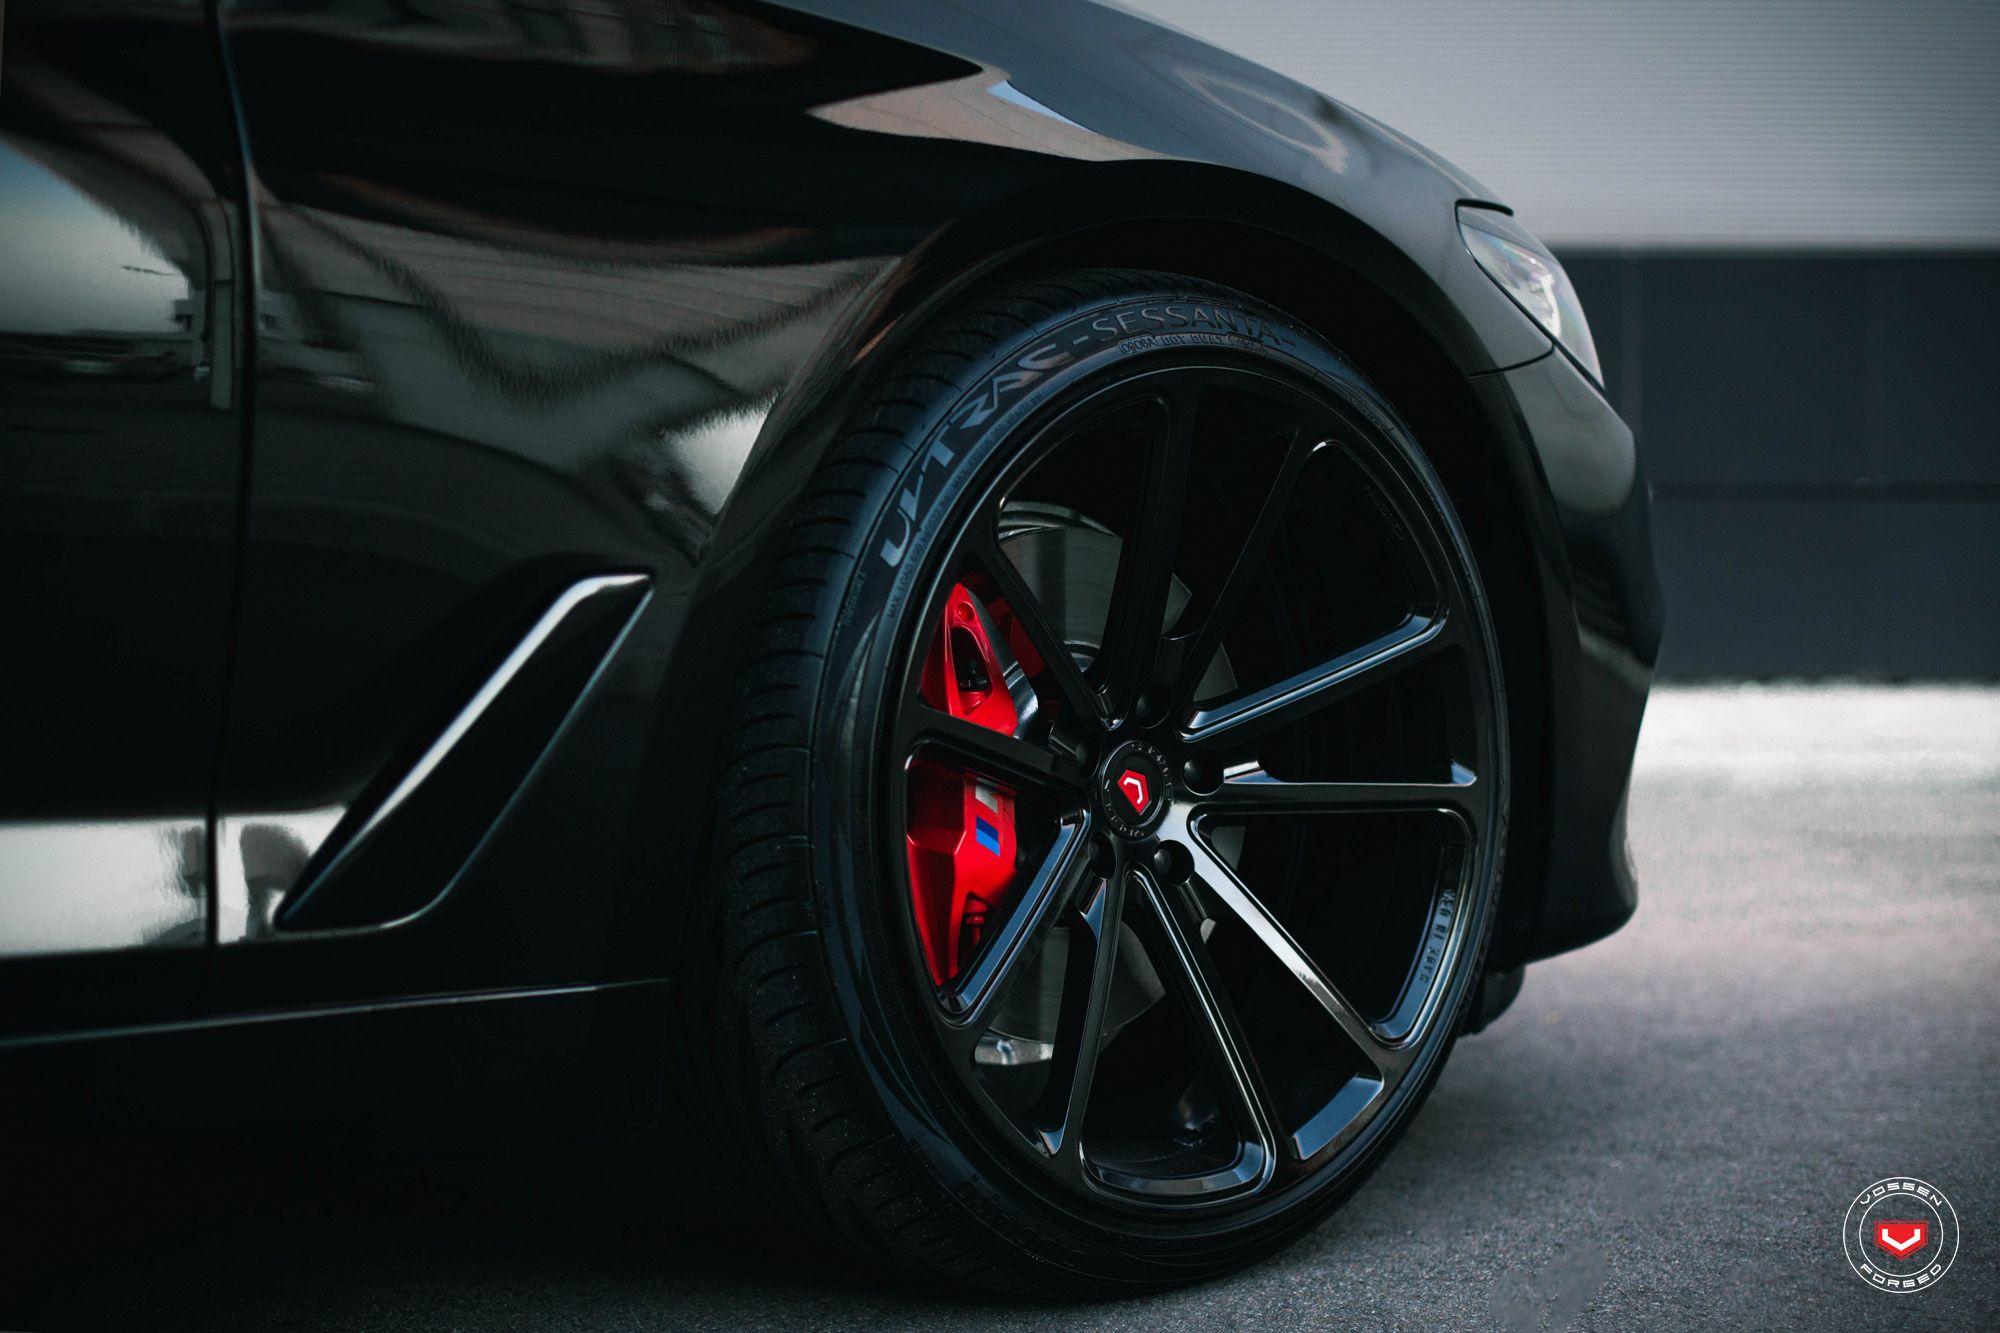 c8ea43fe5fbd  BMW  G30  540i  Sedan  xDrive  MPackage  MPerformance  iPerformance   SportLine  LuxuryLine  SheerDrivingPleasure  Tuning  Drift  Provocative   Eyes  Luxury ...